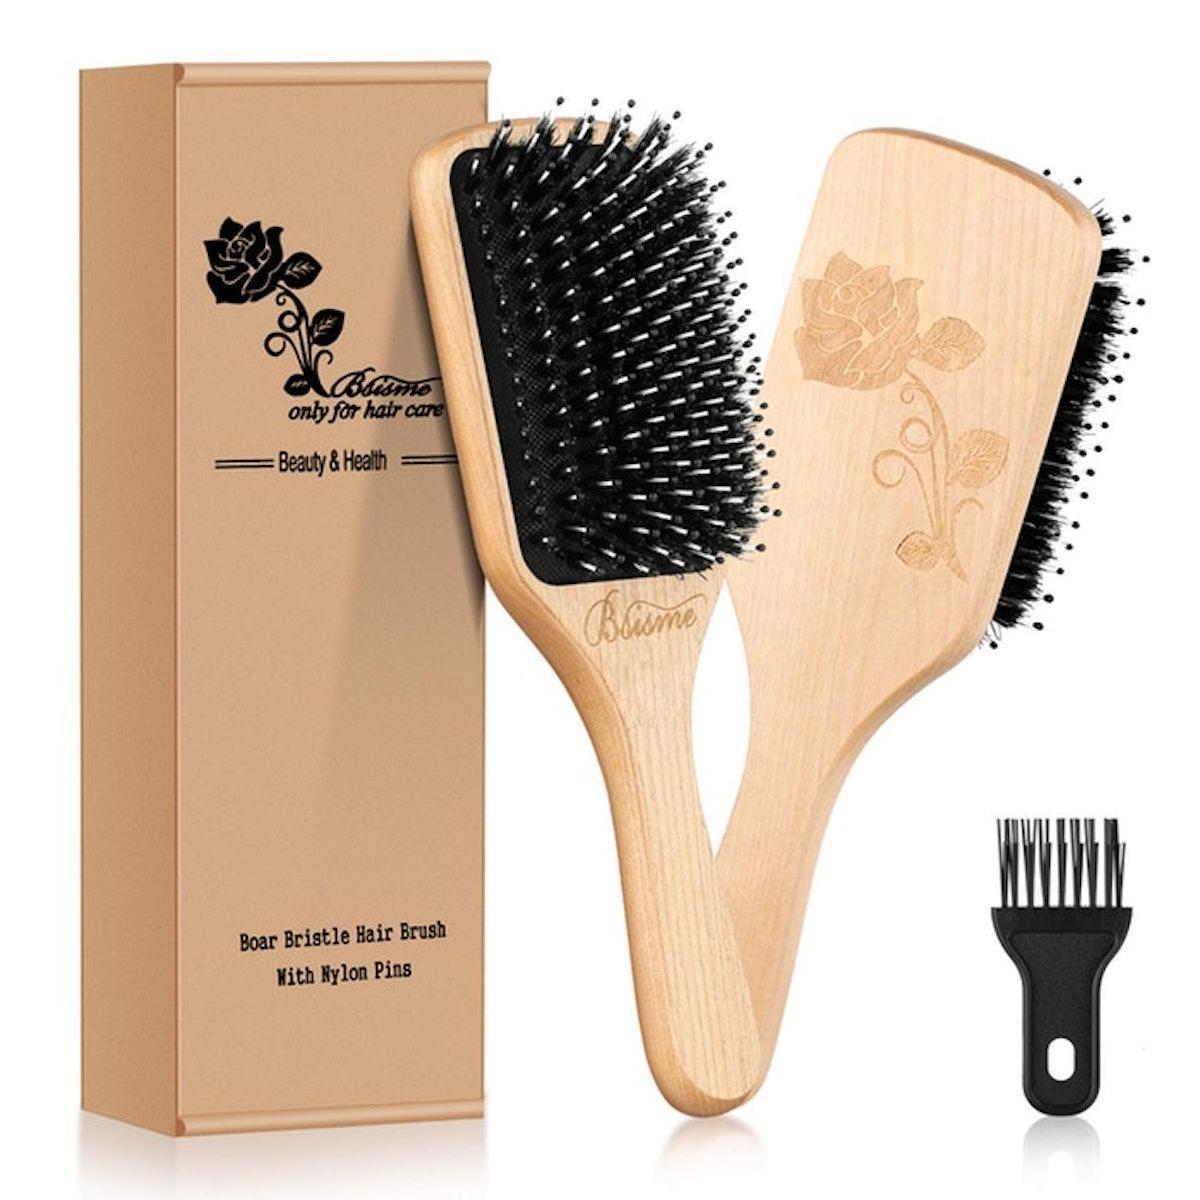 Bsisme Boar Bristle Hairbrush